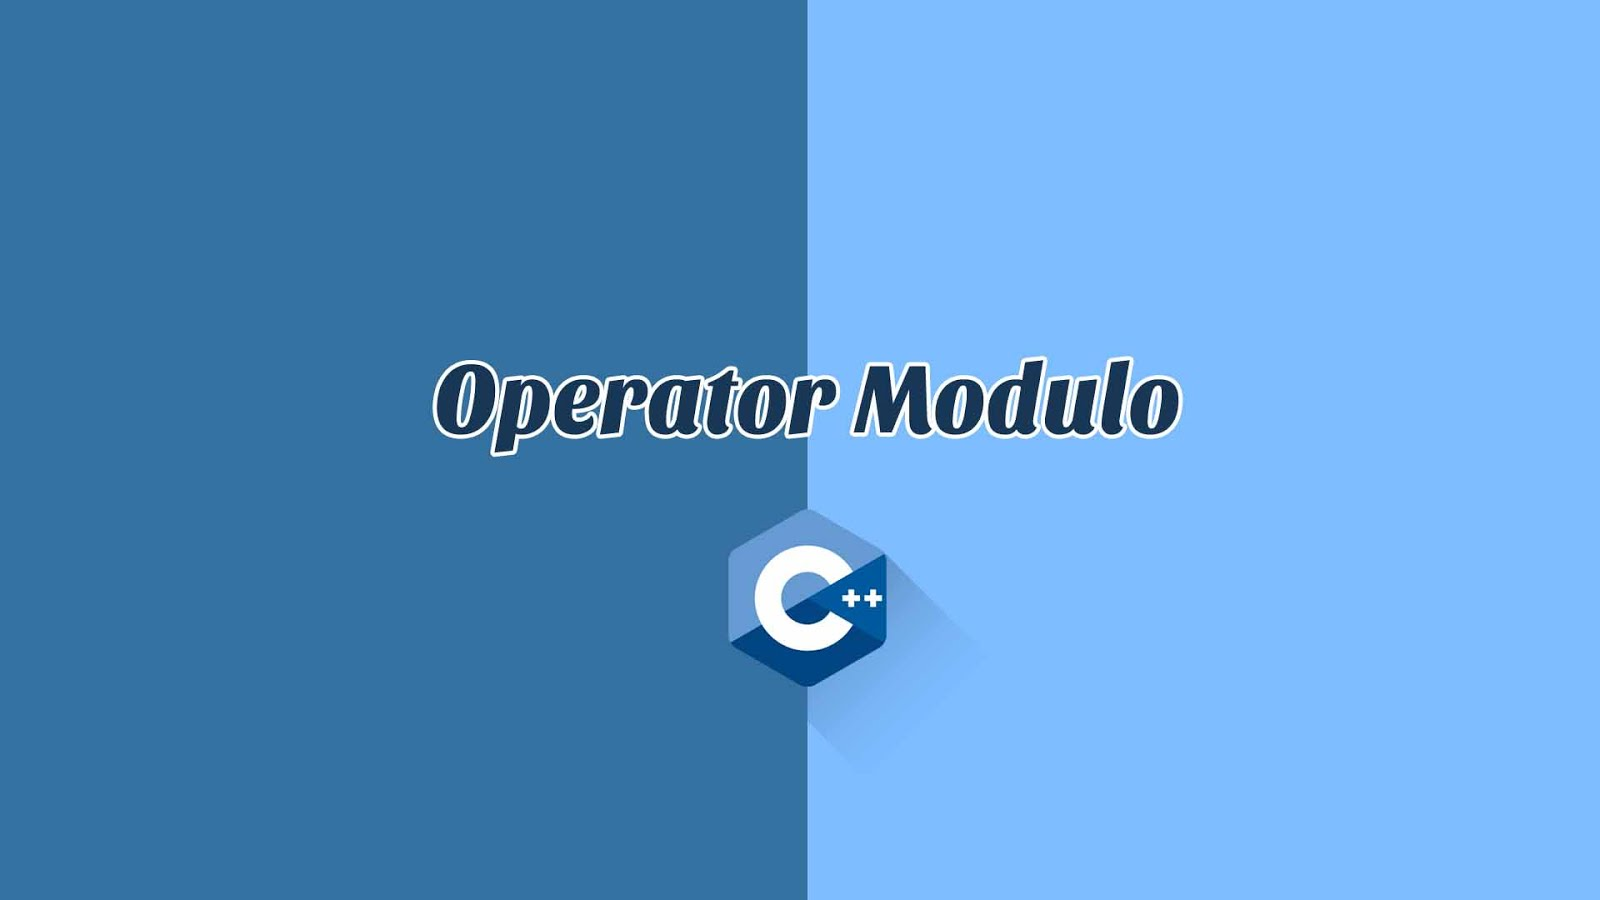 Operator Modulo ( % ) di C++